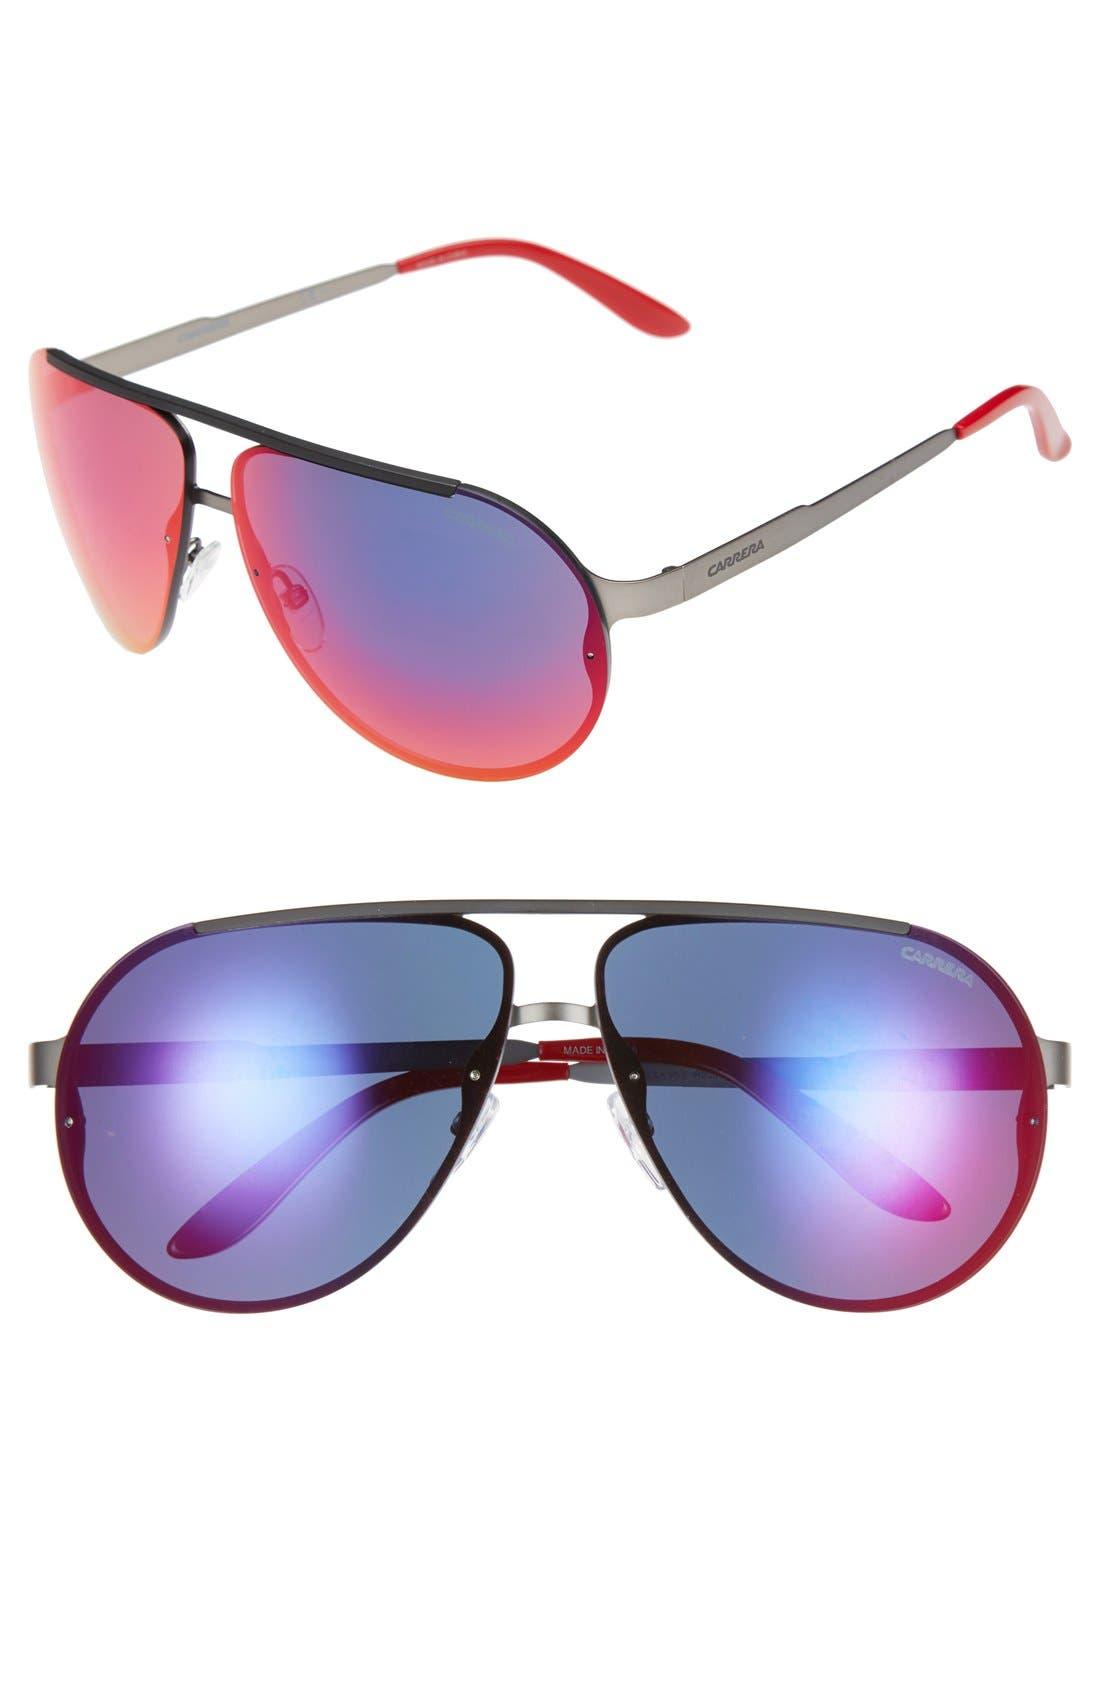 65mm Aviator Sunglasses,                             Main thumbnail 3, color,